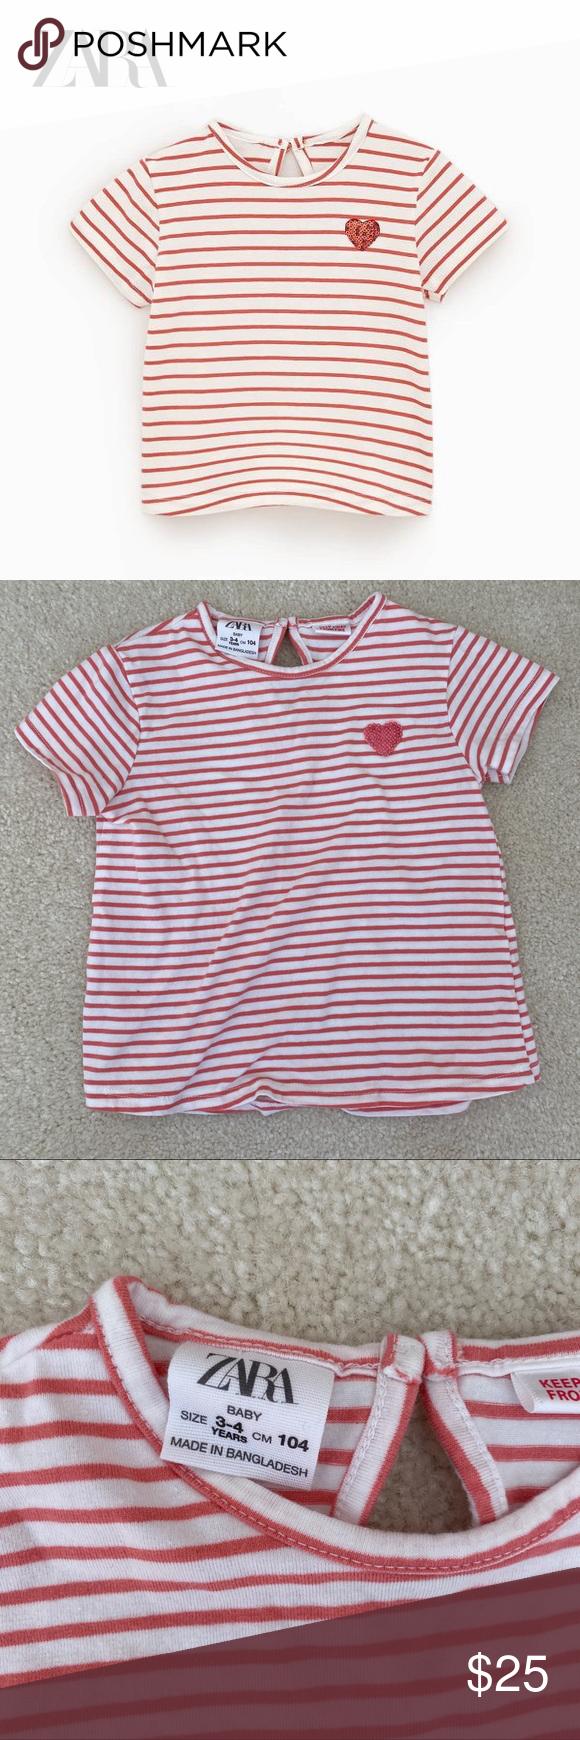 Zara Baby Striped Sequin Heart Shirt In amazing and clean condition. Zara Shirts... ,  #amazing #BABY #Clean #condition #heart #SEQUIN #Shirt #Shirts #STRIPED #ZARA #zarakidsred